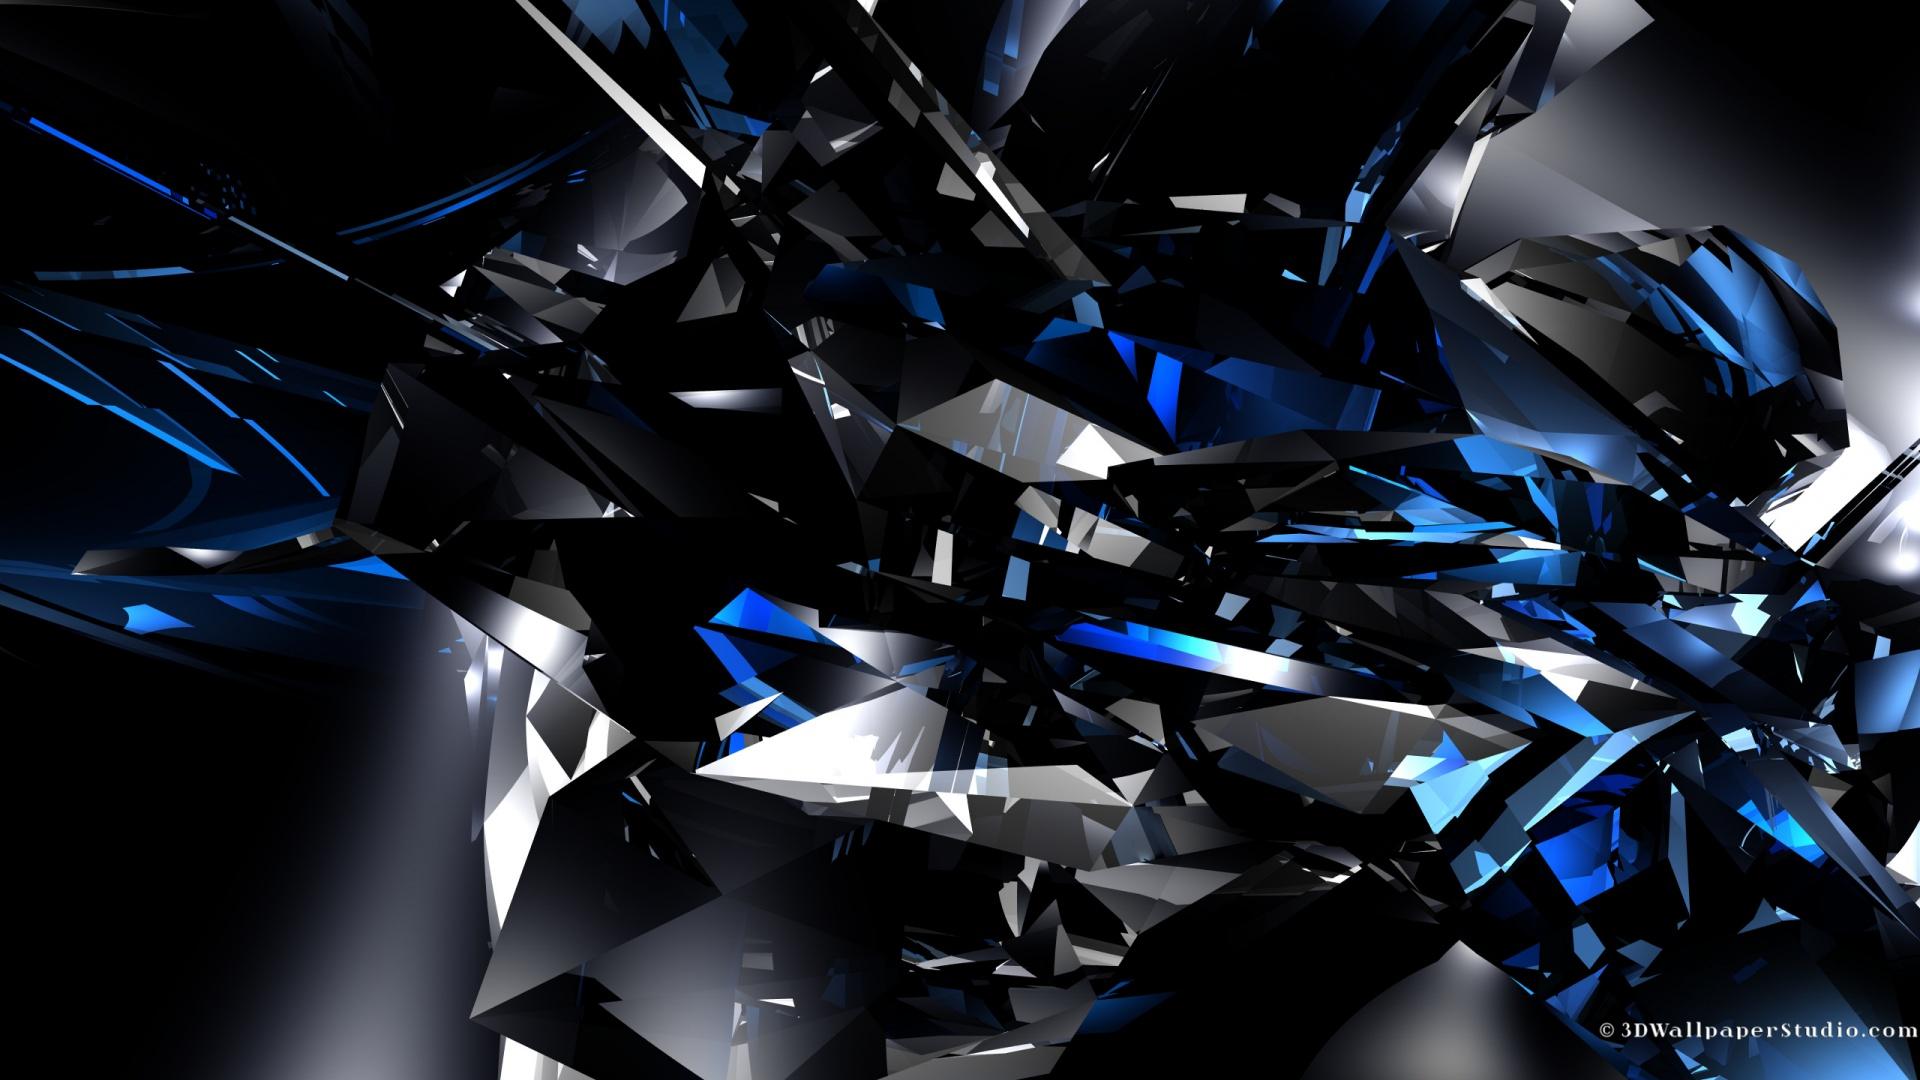 3D blue crystals wallpapers 1920x1080 1920x1080